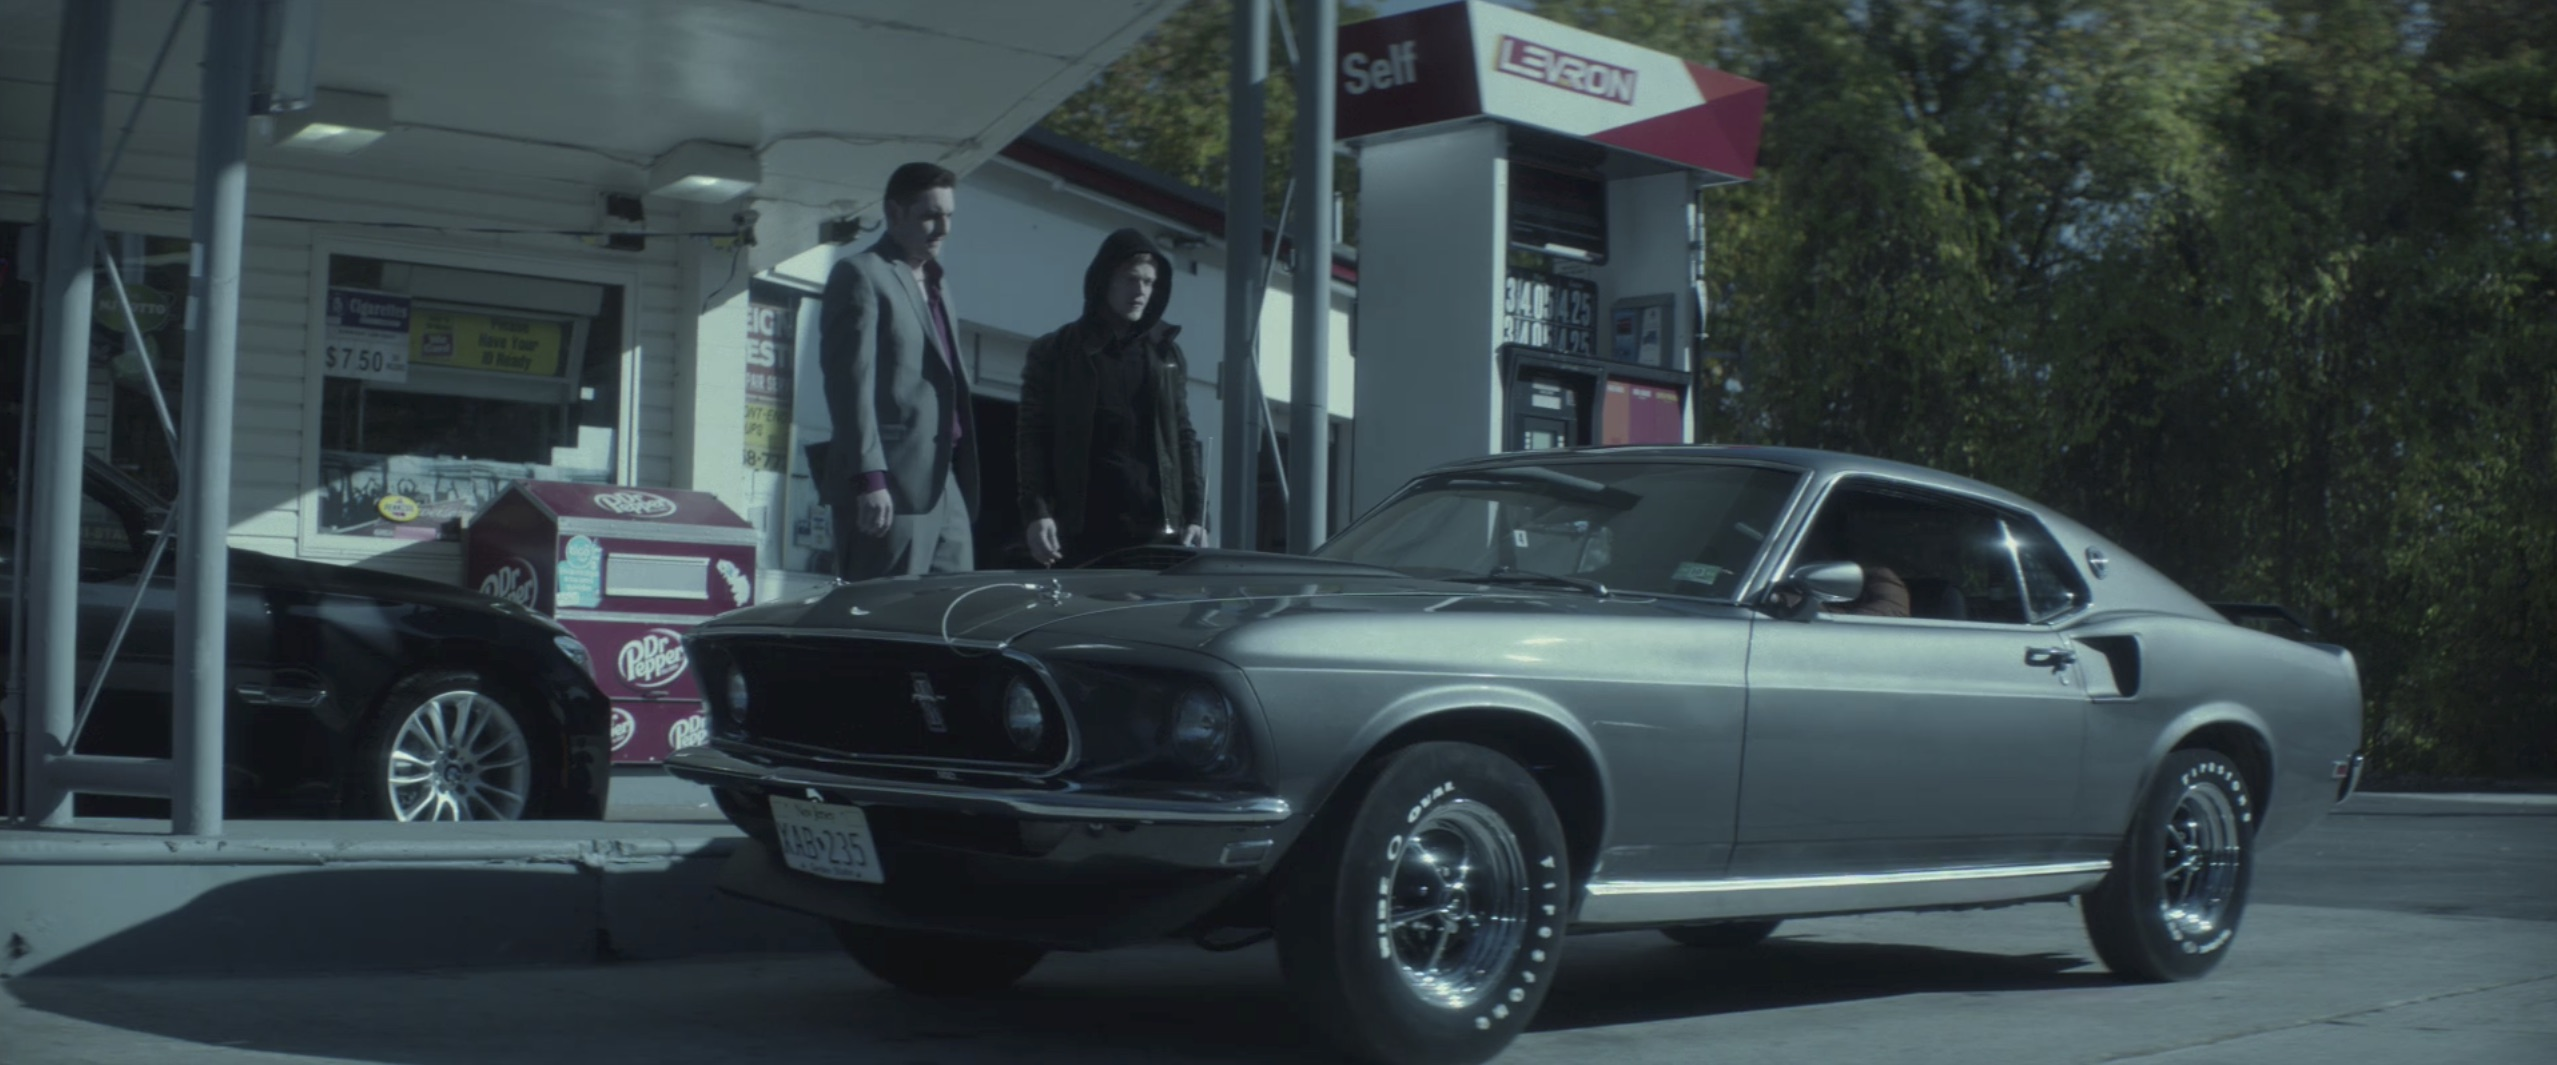 John Wick Mustang at a gas station